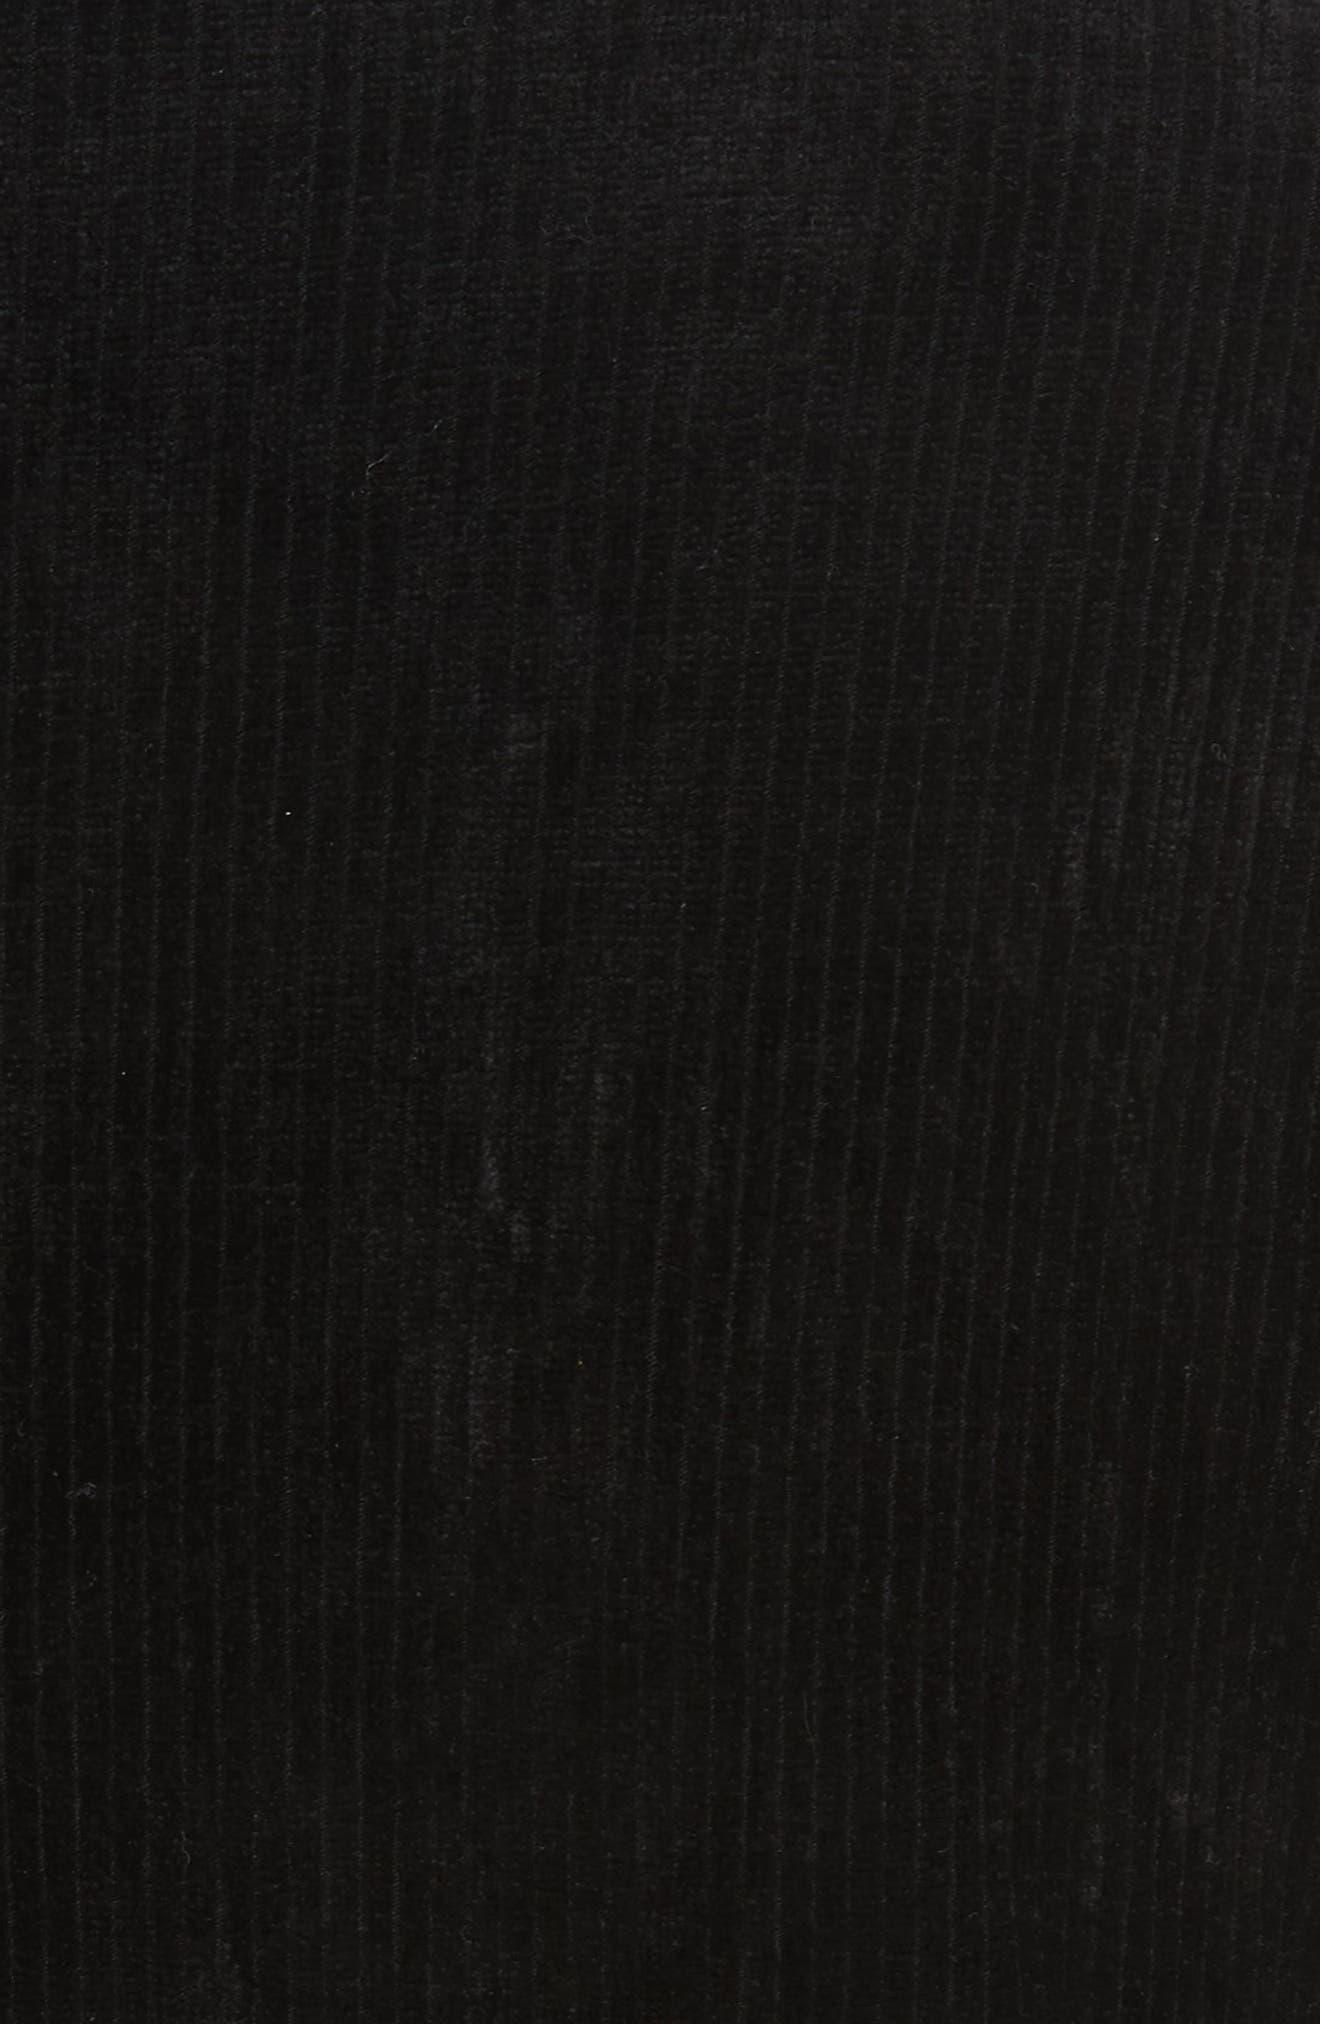 Abigail Funnel Neck Dress,                             Alternate thumbnail 3, color,                             Black